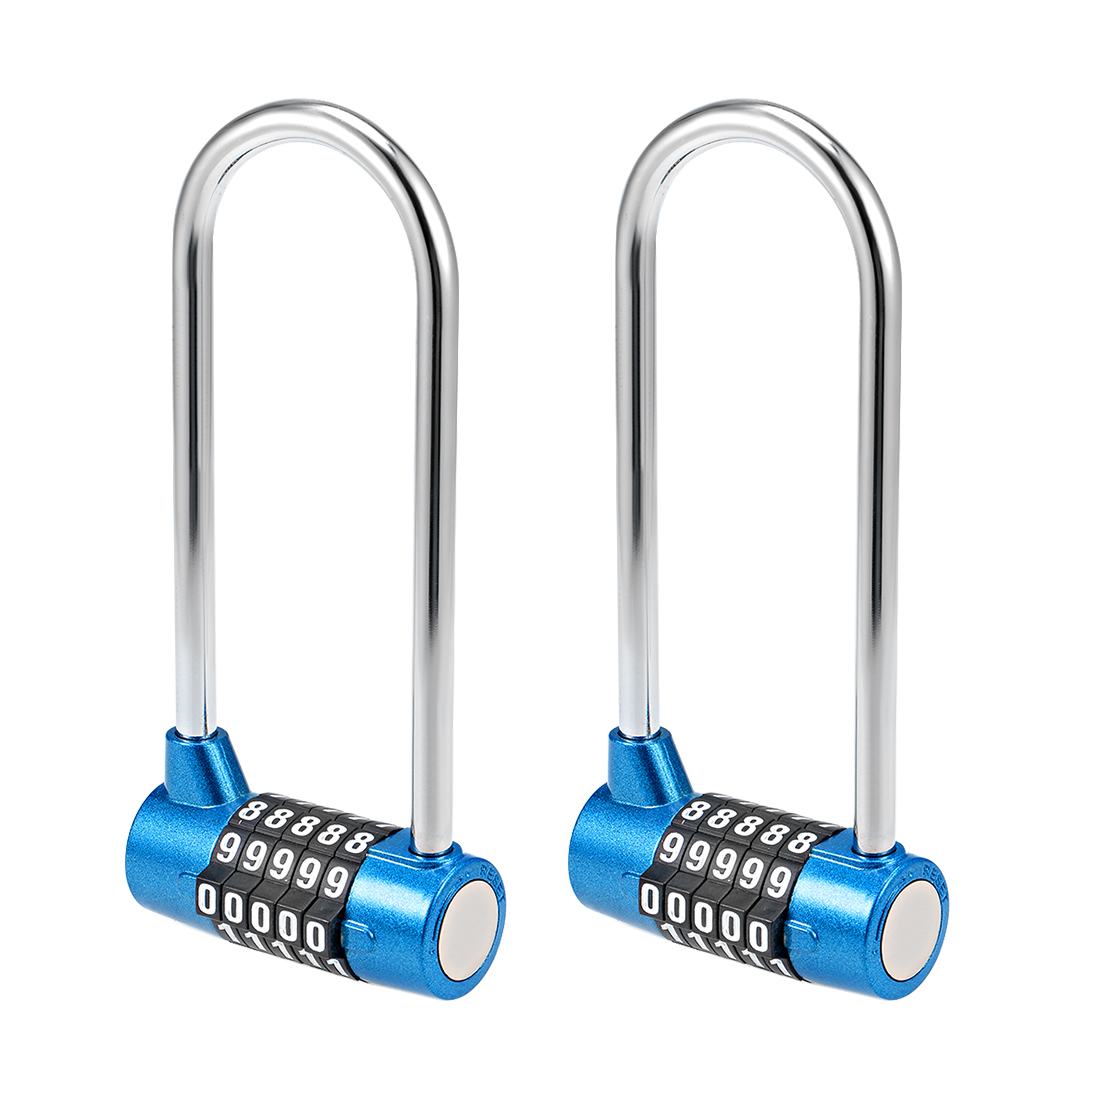 5-Digit Combination Padlock 7mm Steel Shackle Resettable Lock Blue 2Pcs